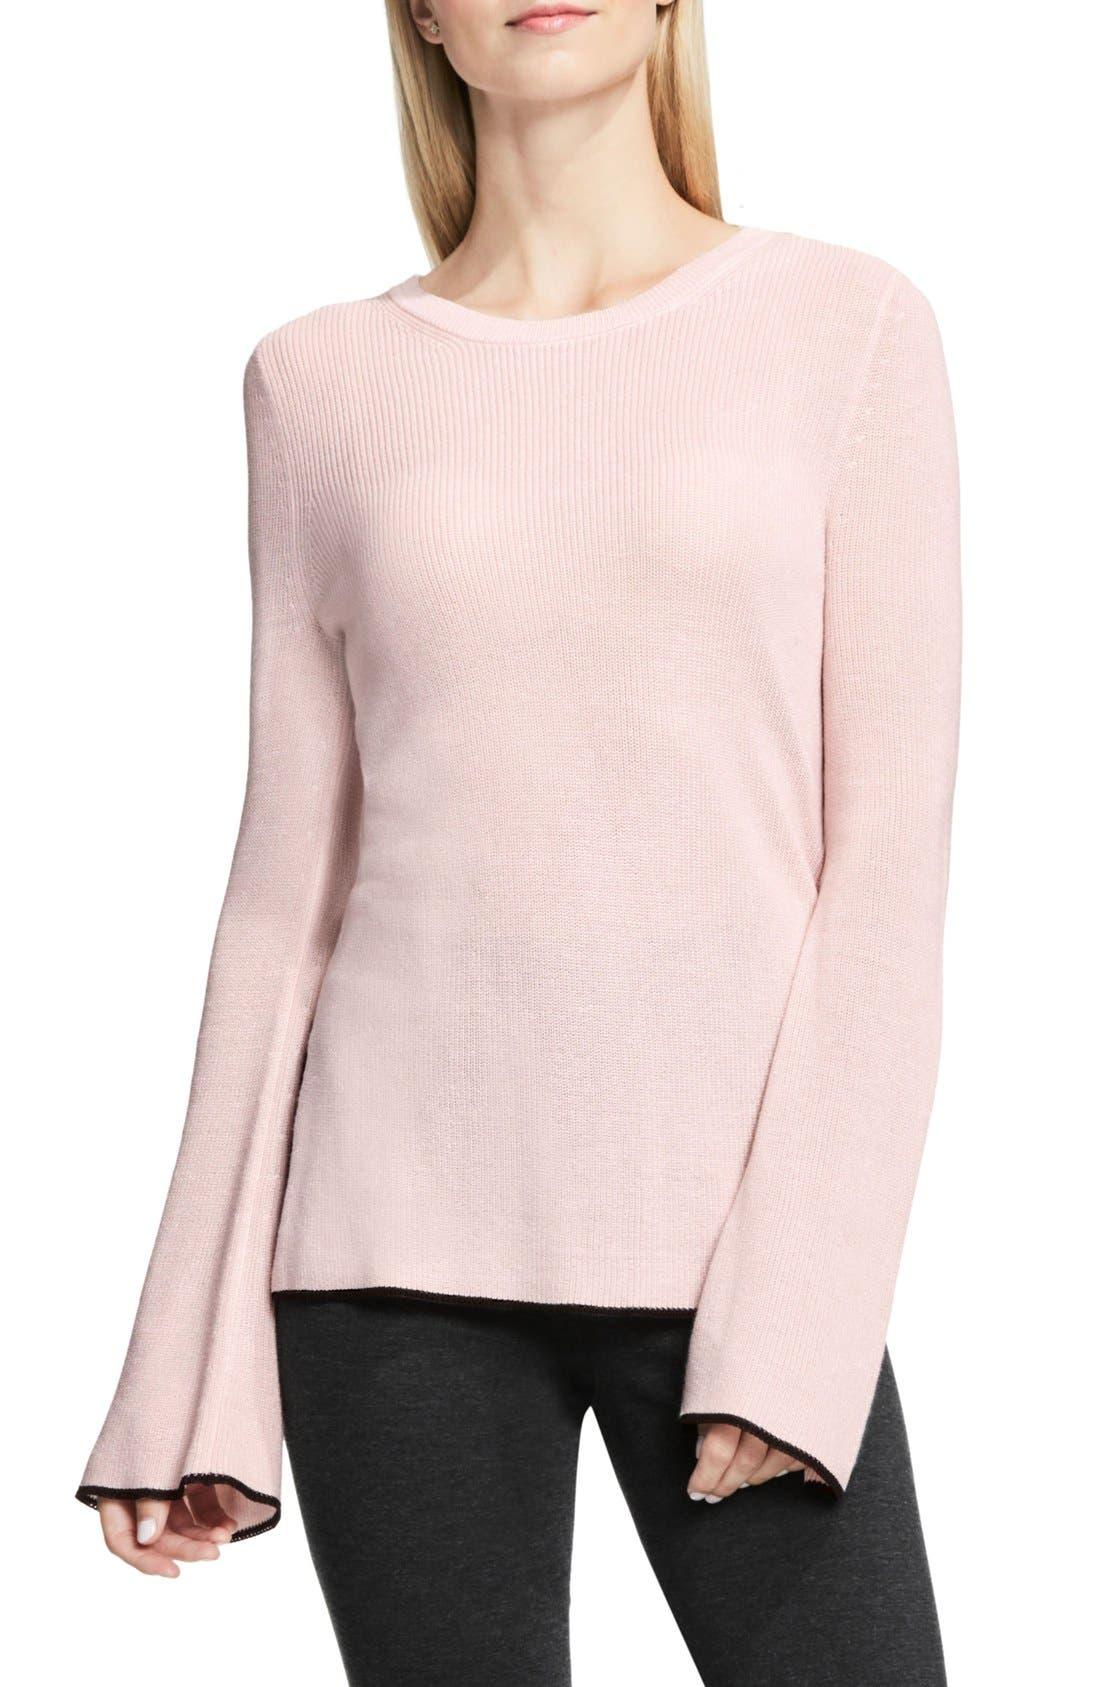 Alternate Image 1 Selected - Vince Camuto Bell Sleeve Sweater (Regular & Petite)